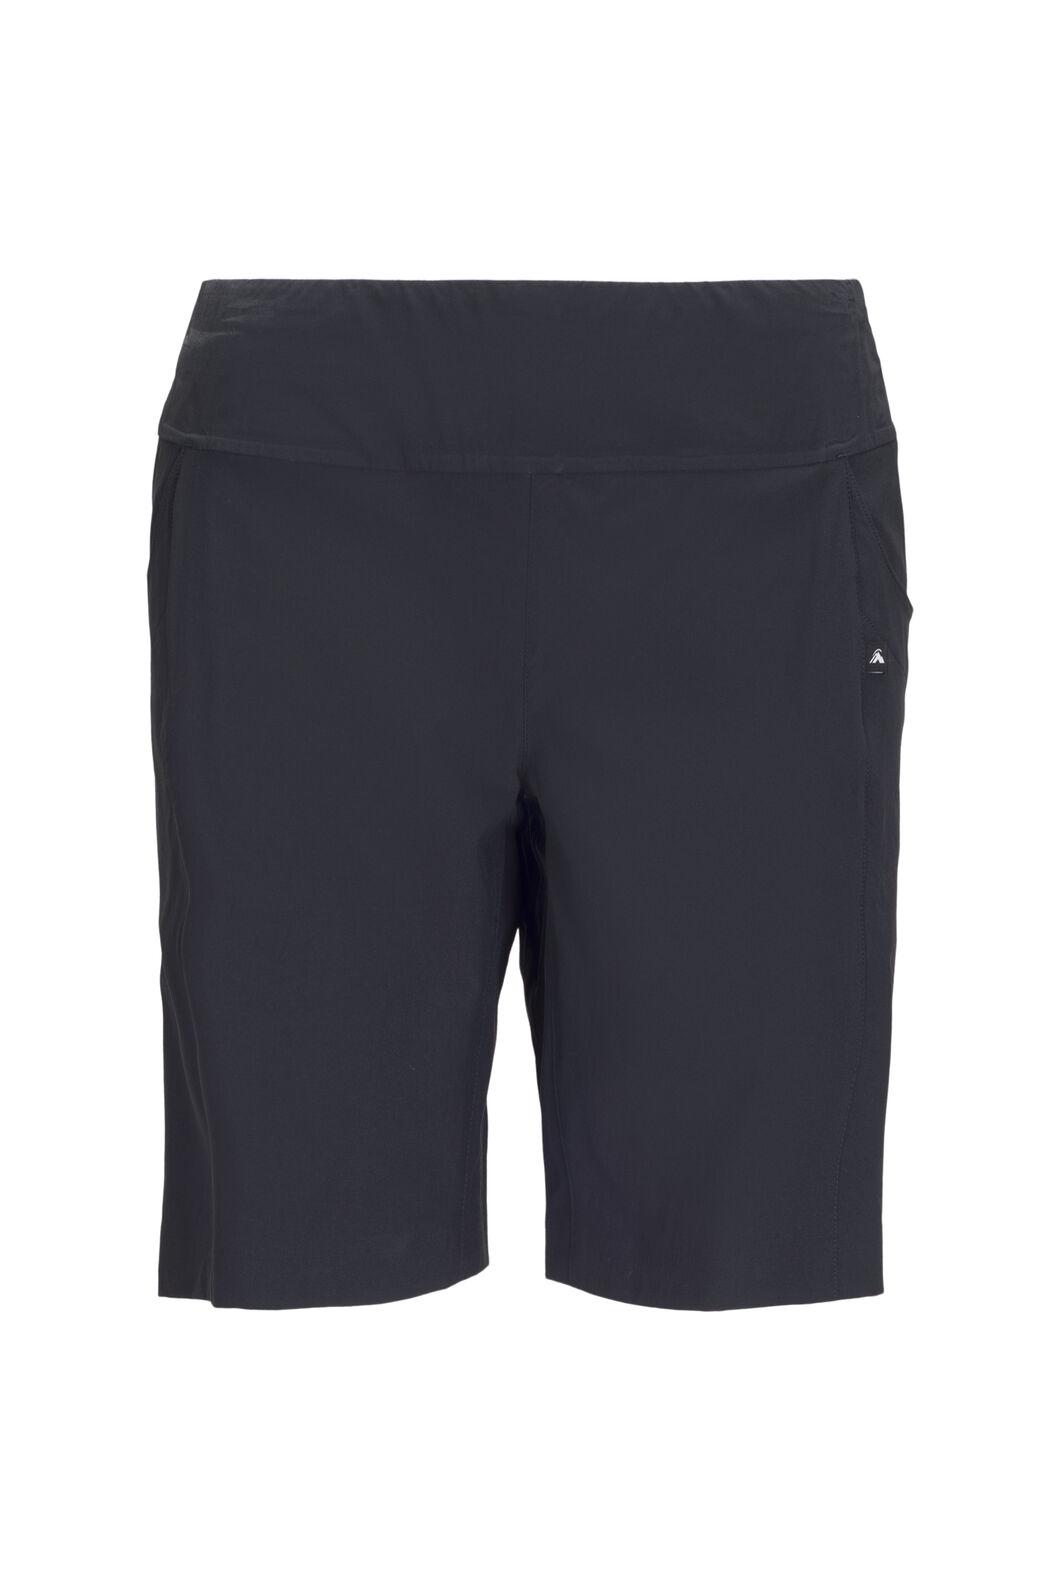 Macpac Boulder Shorts — Women's, Black, hi-res